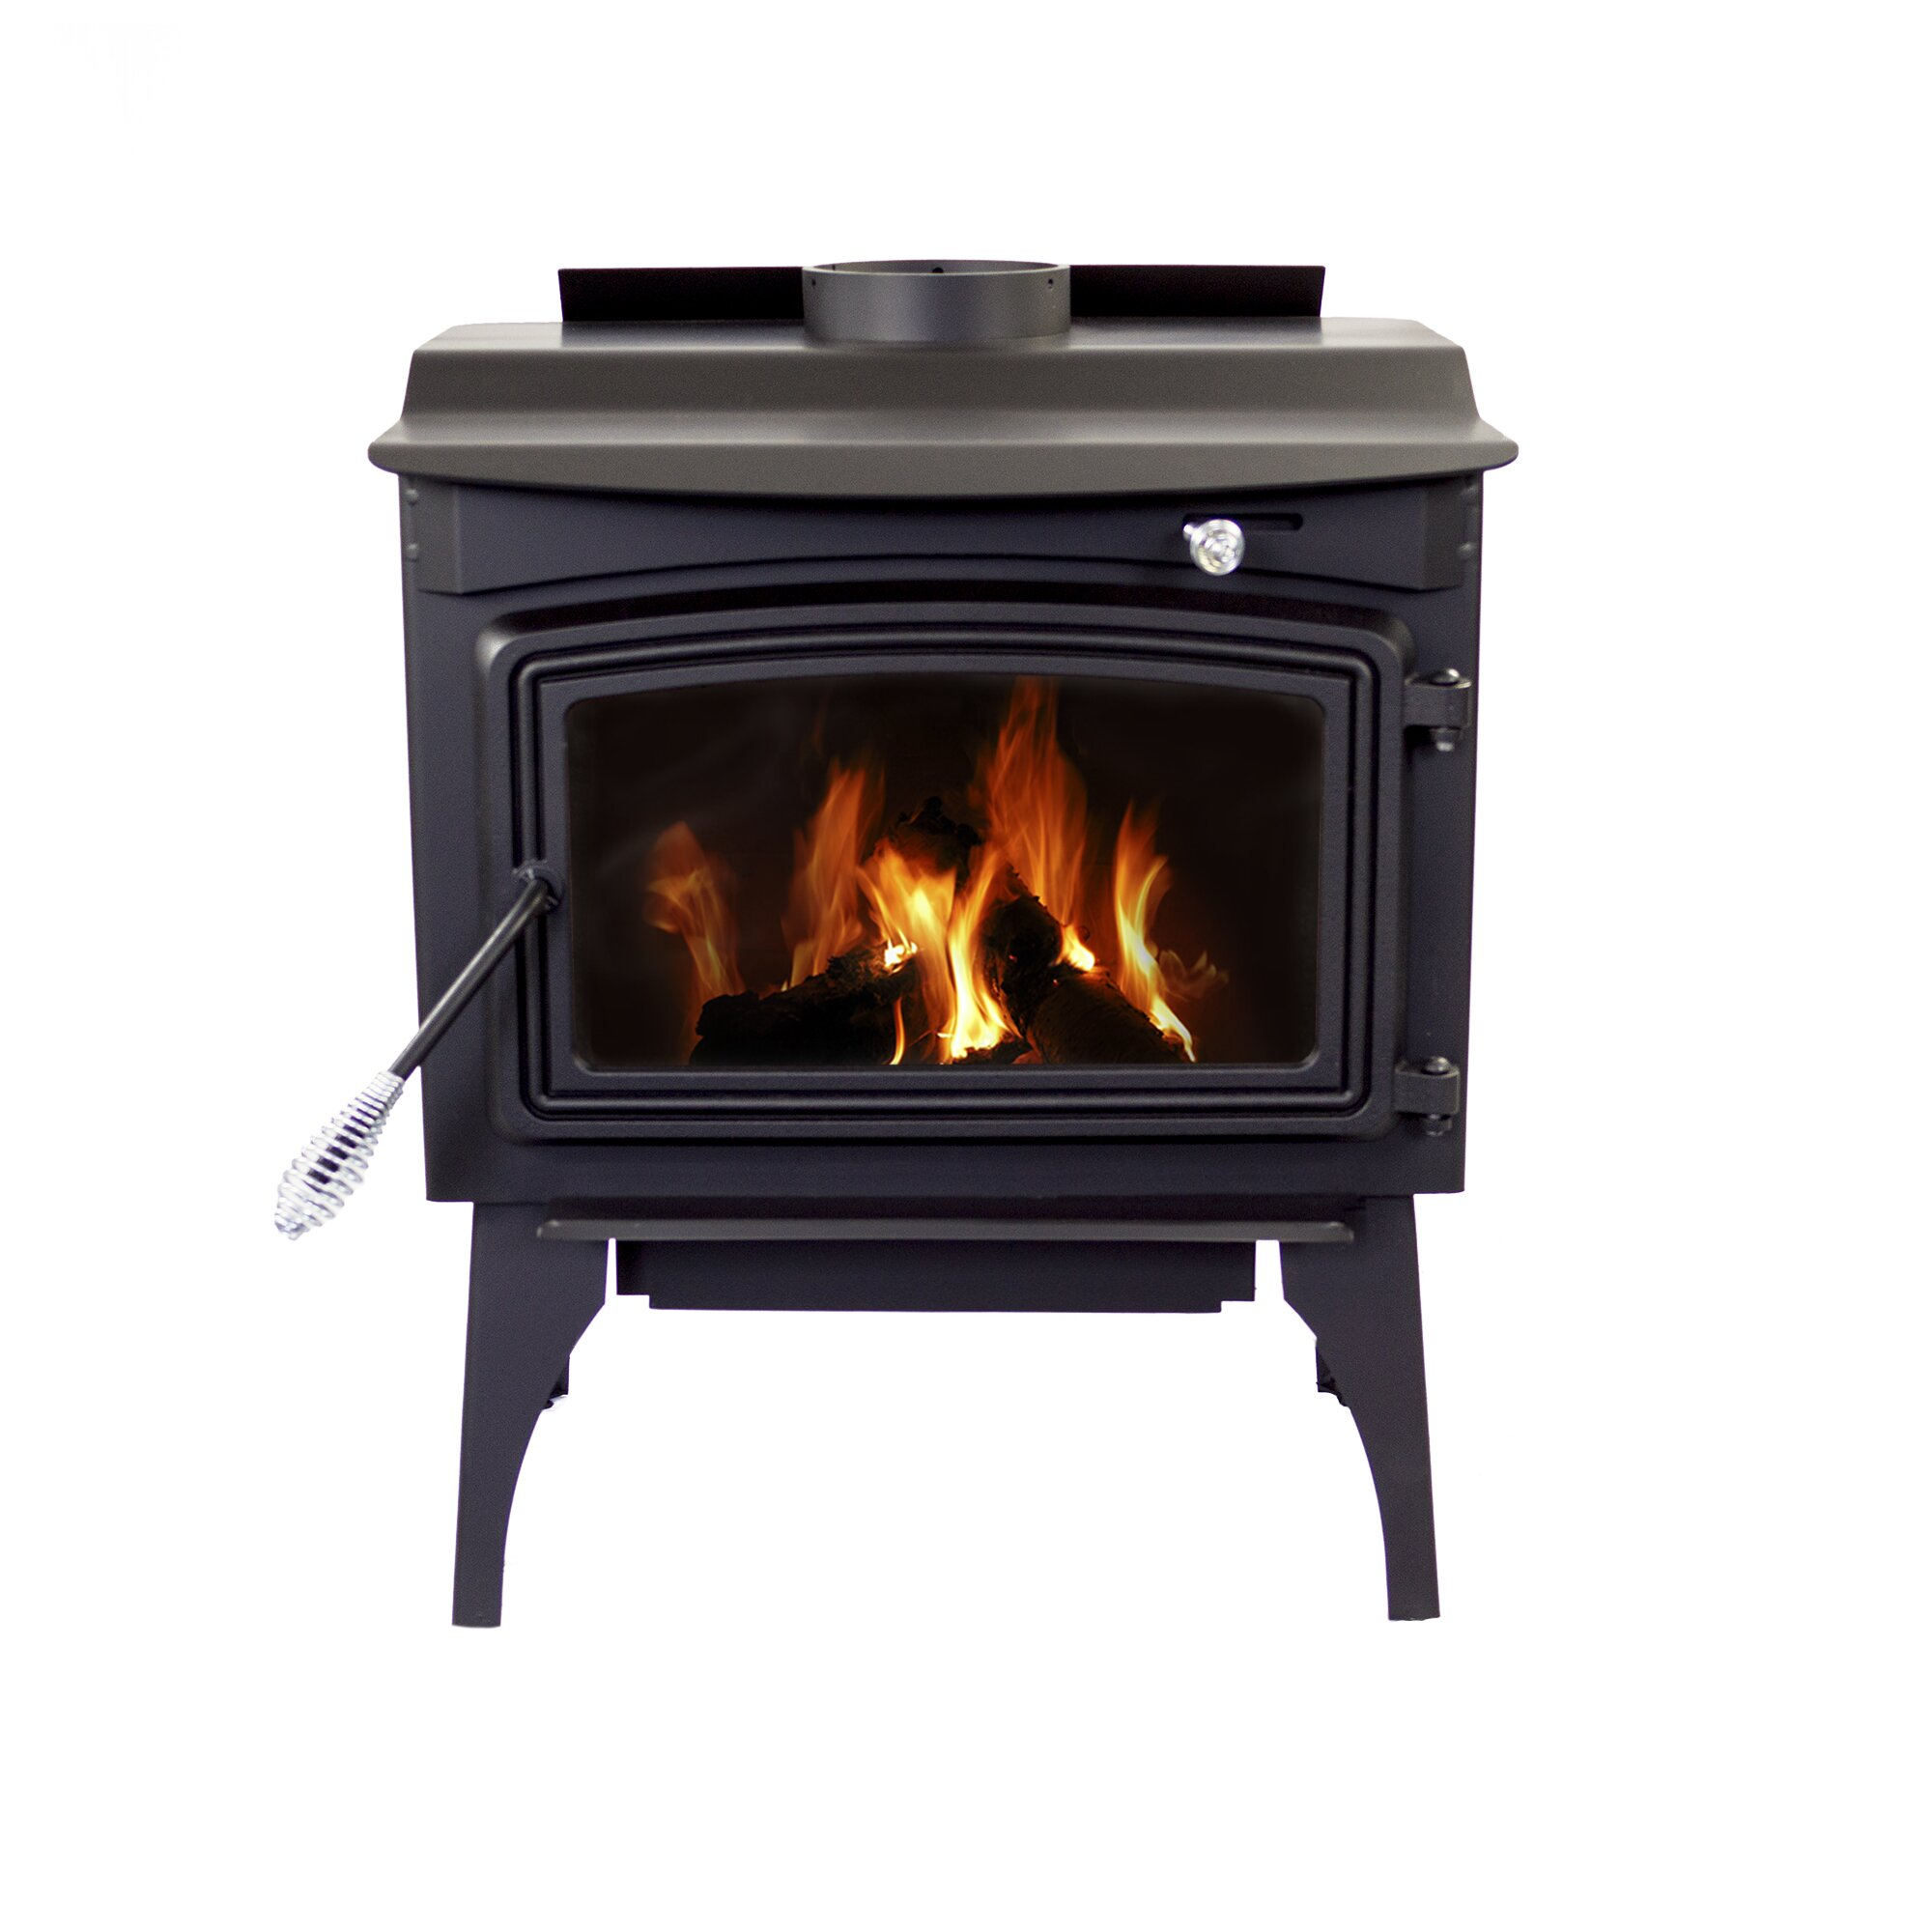 Propane Gas Stove Lowes 100 Charmglow Gas Fireplace Parts Gas Fireplace Repair Won Gas Stove